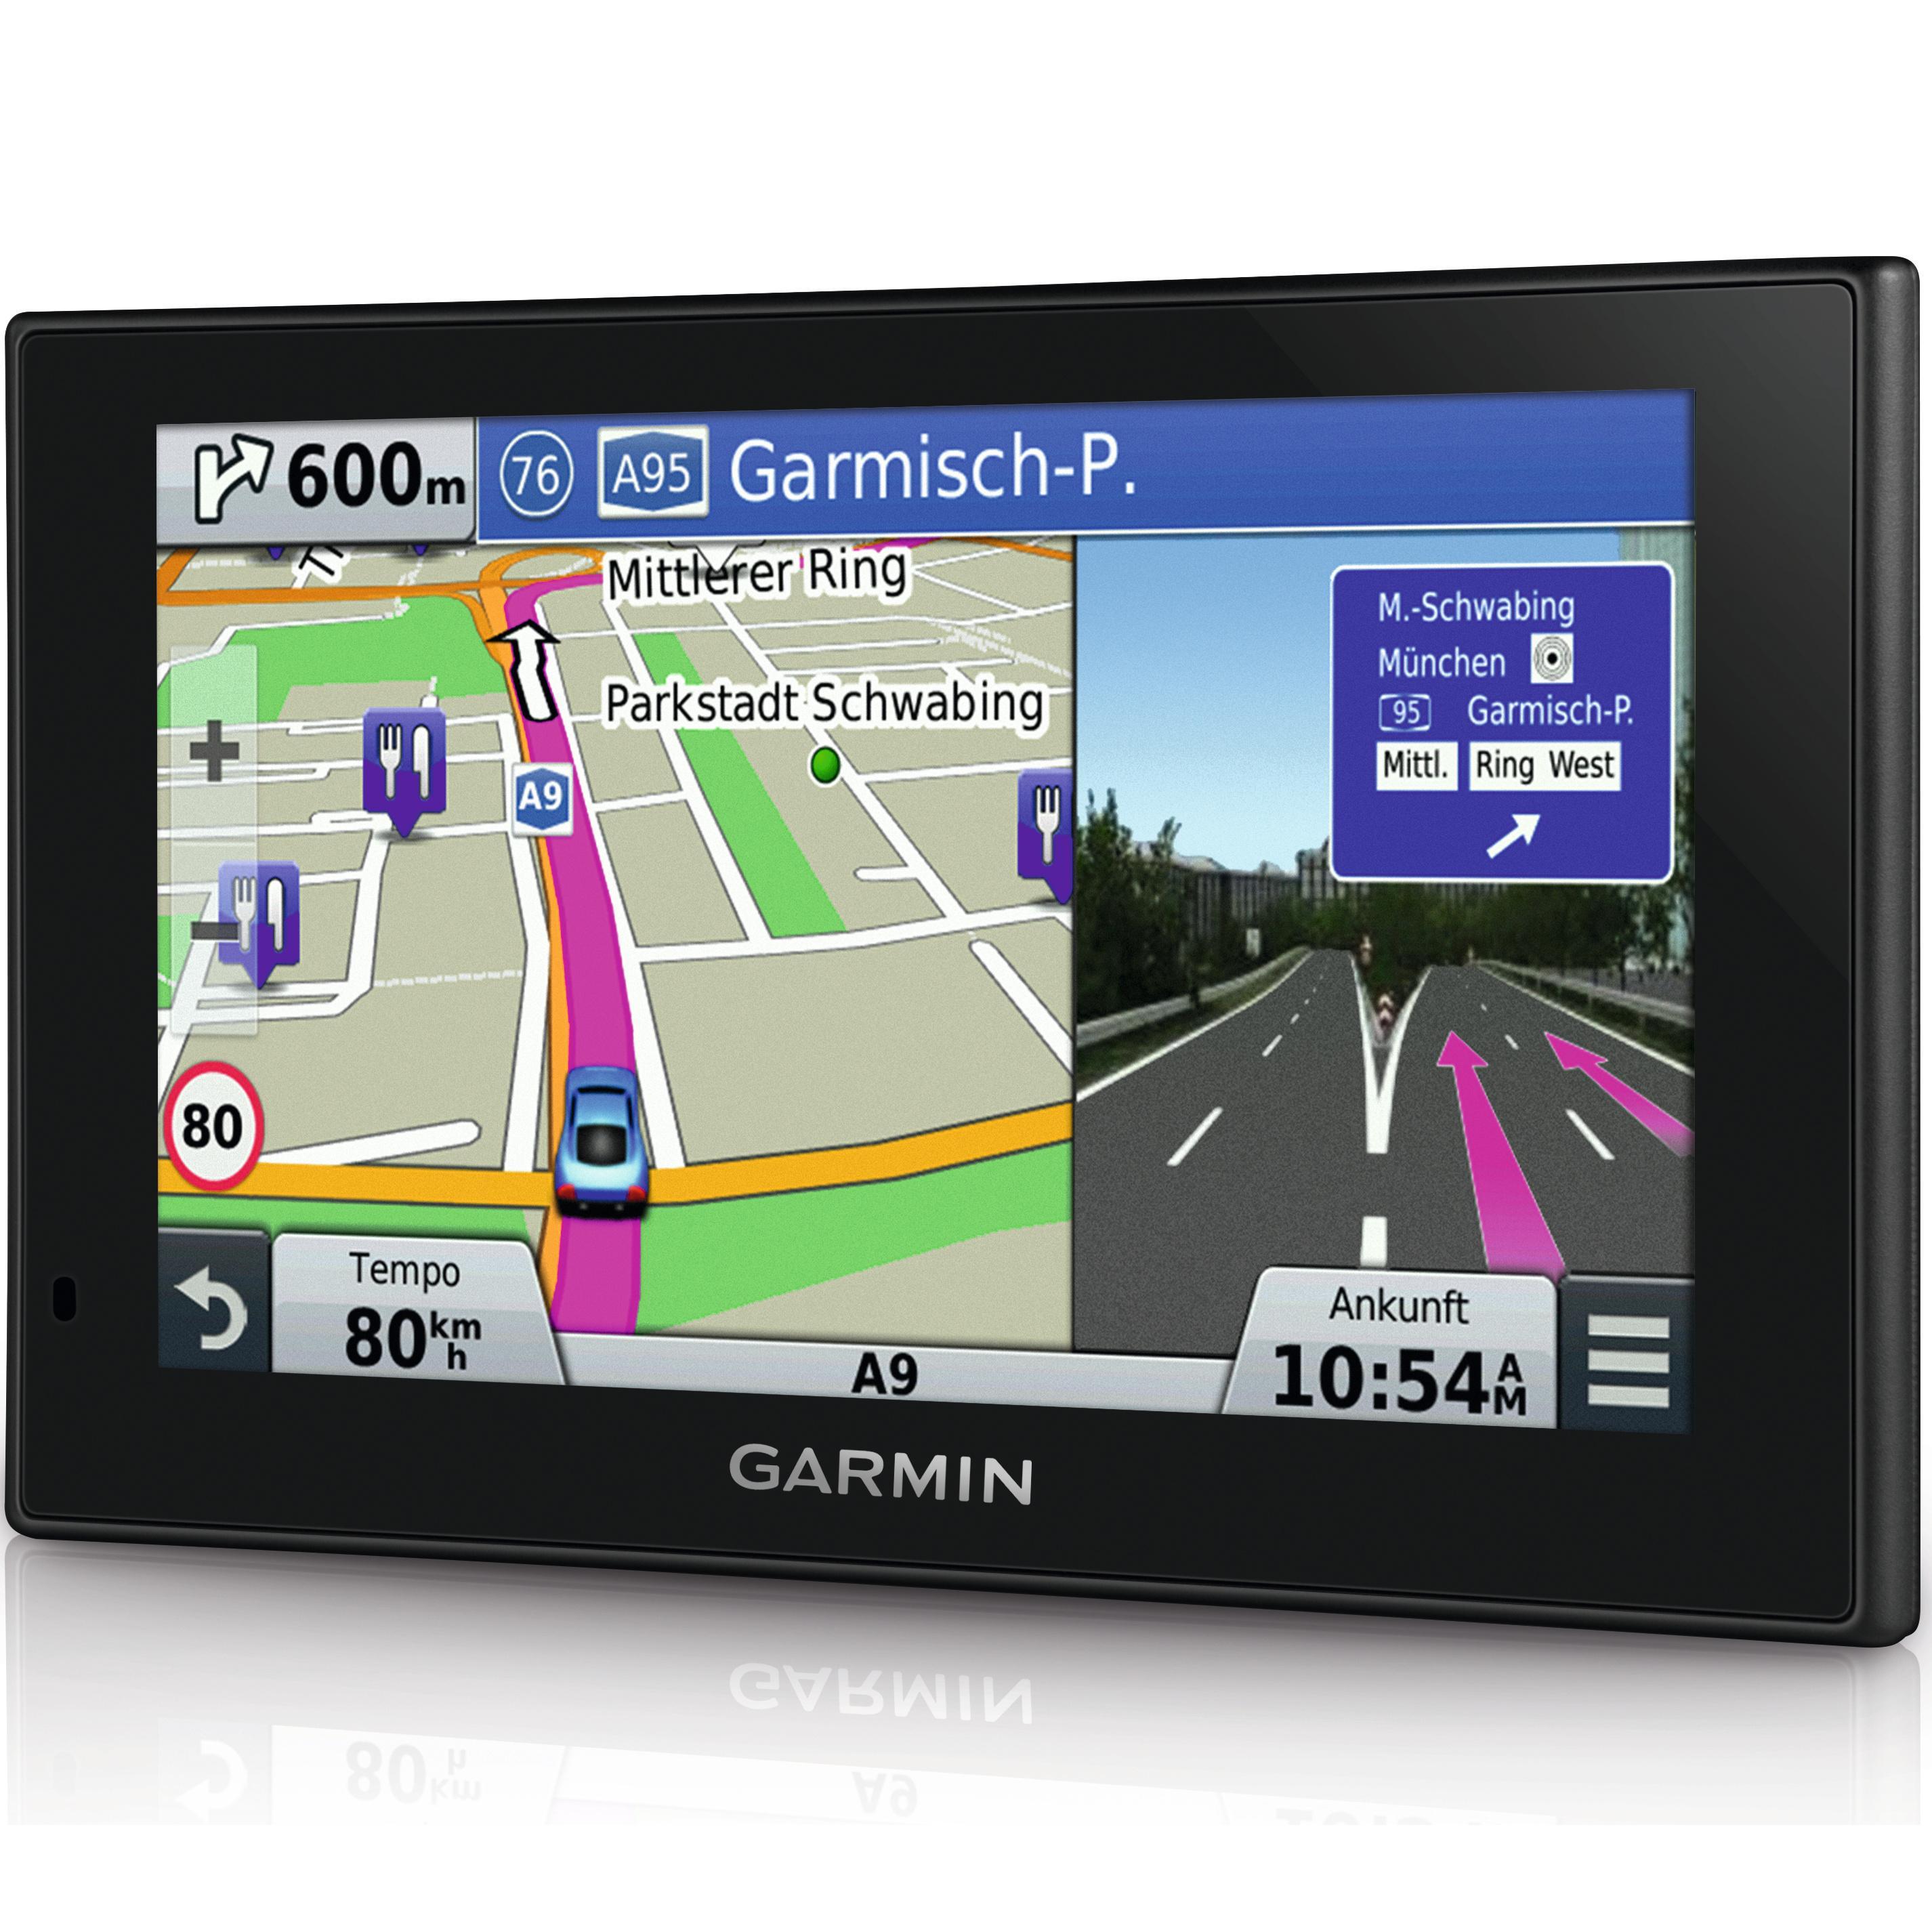 Garmin nüvi 2699 LMT-D EU Navigationsgerät: Amazon.de